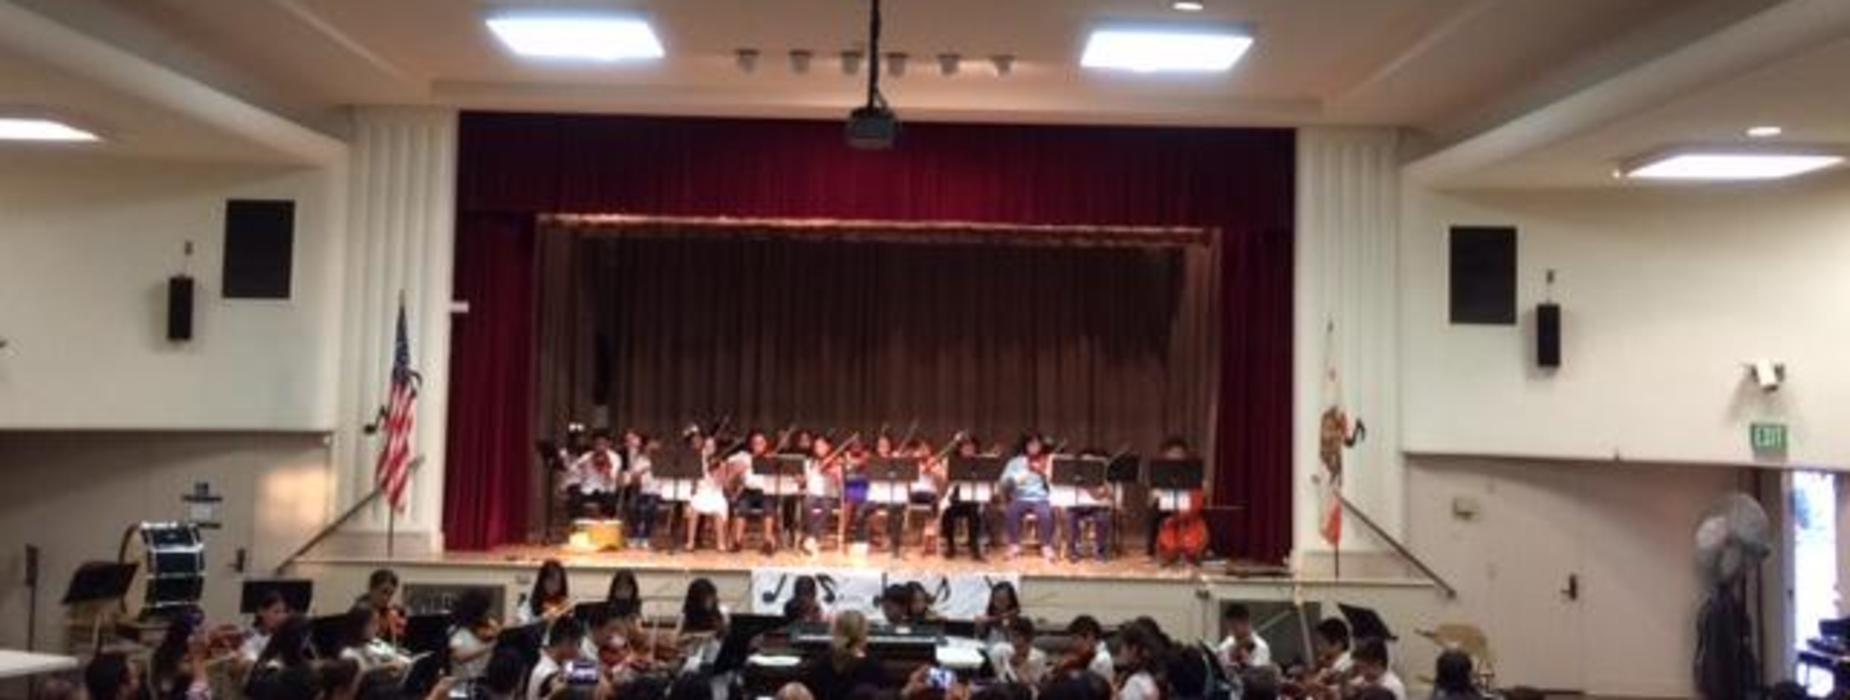 Marguerita School Band Performance